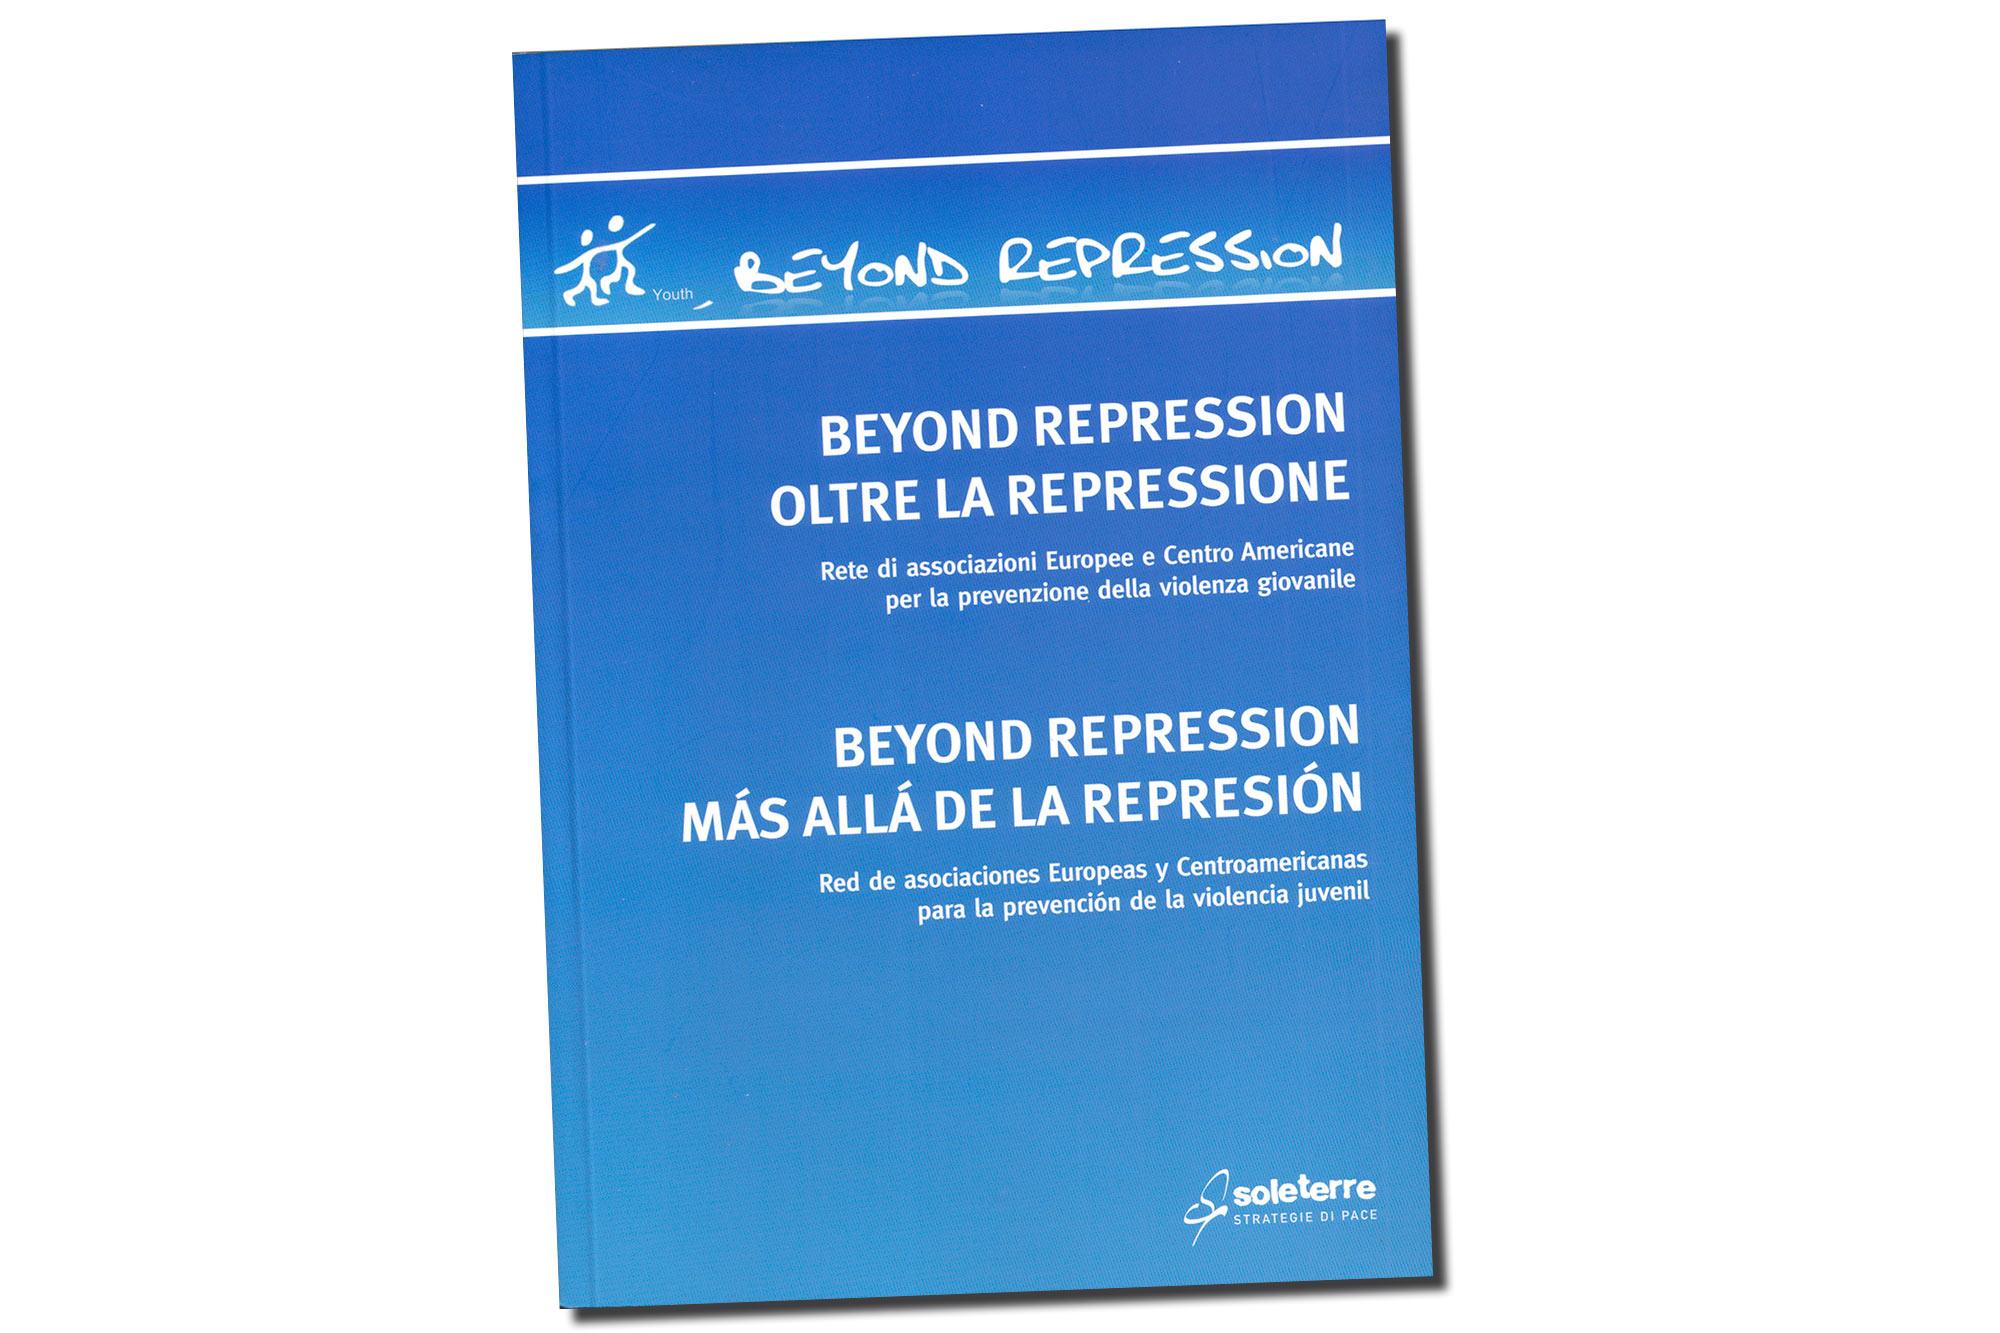 Beyond Repression